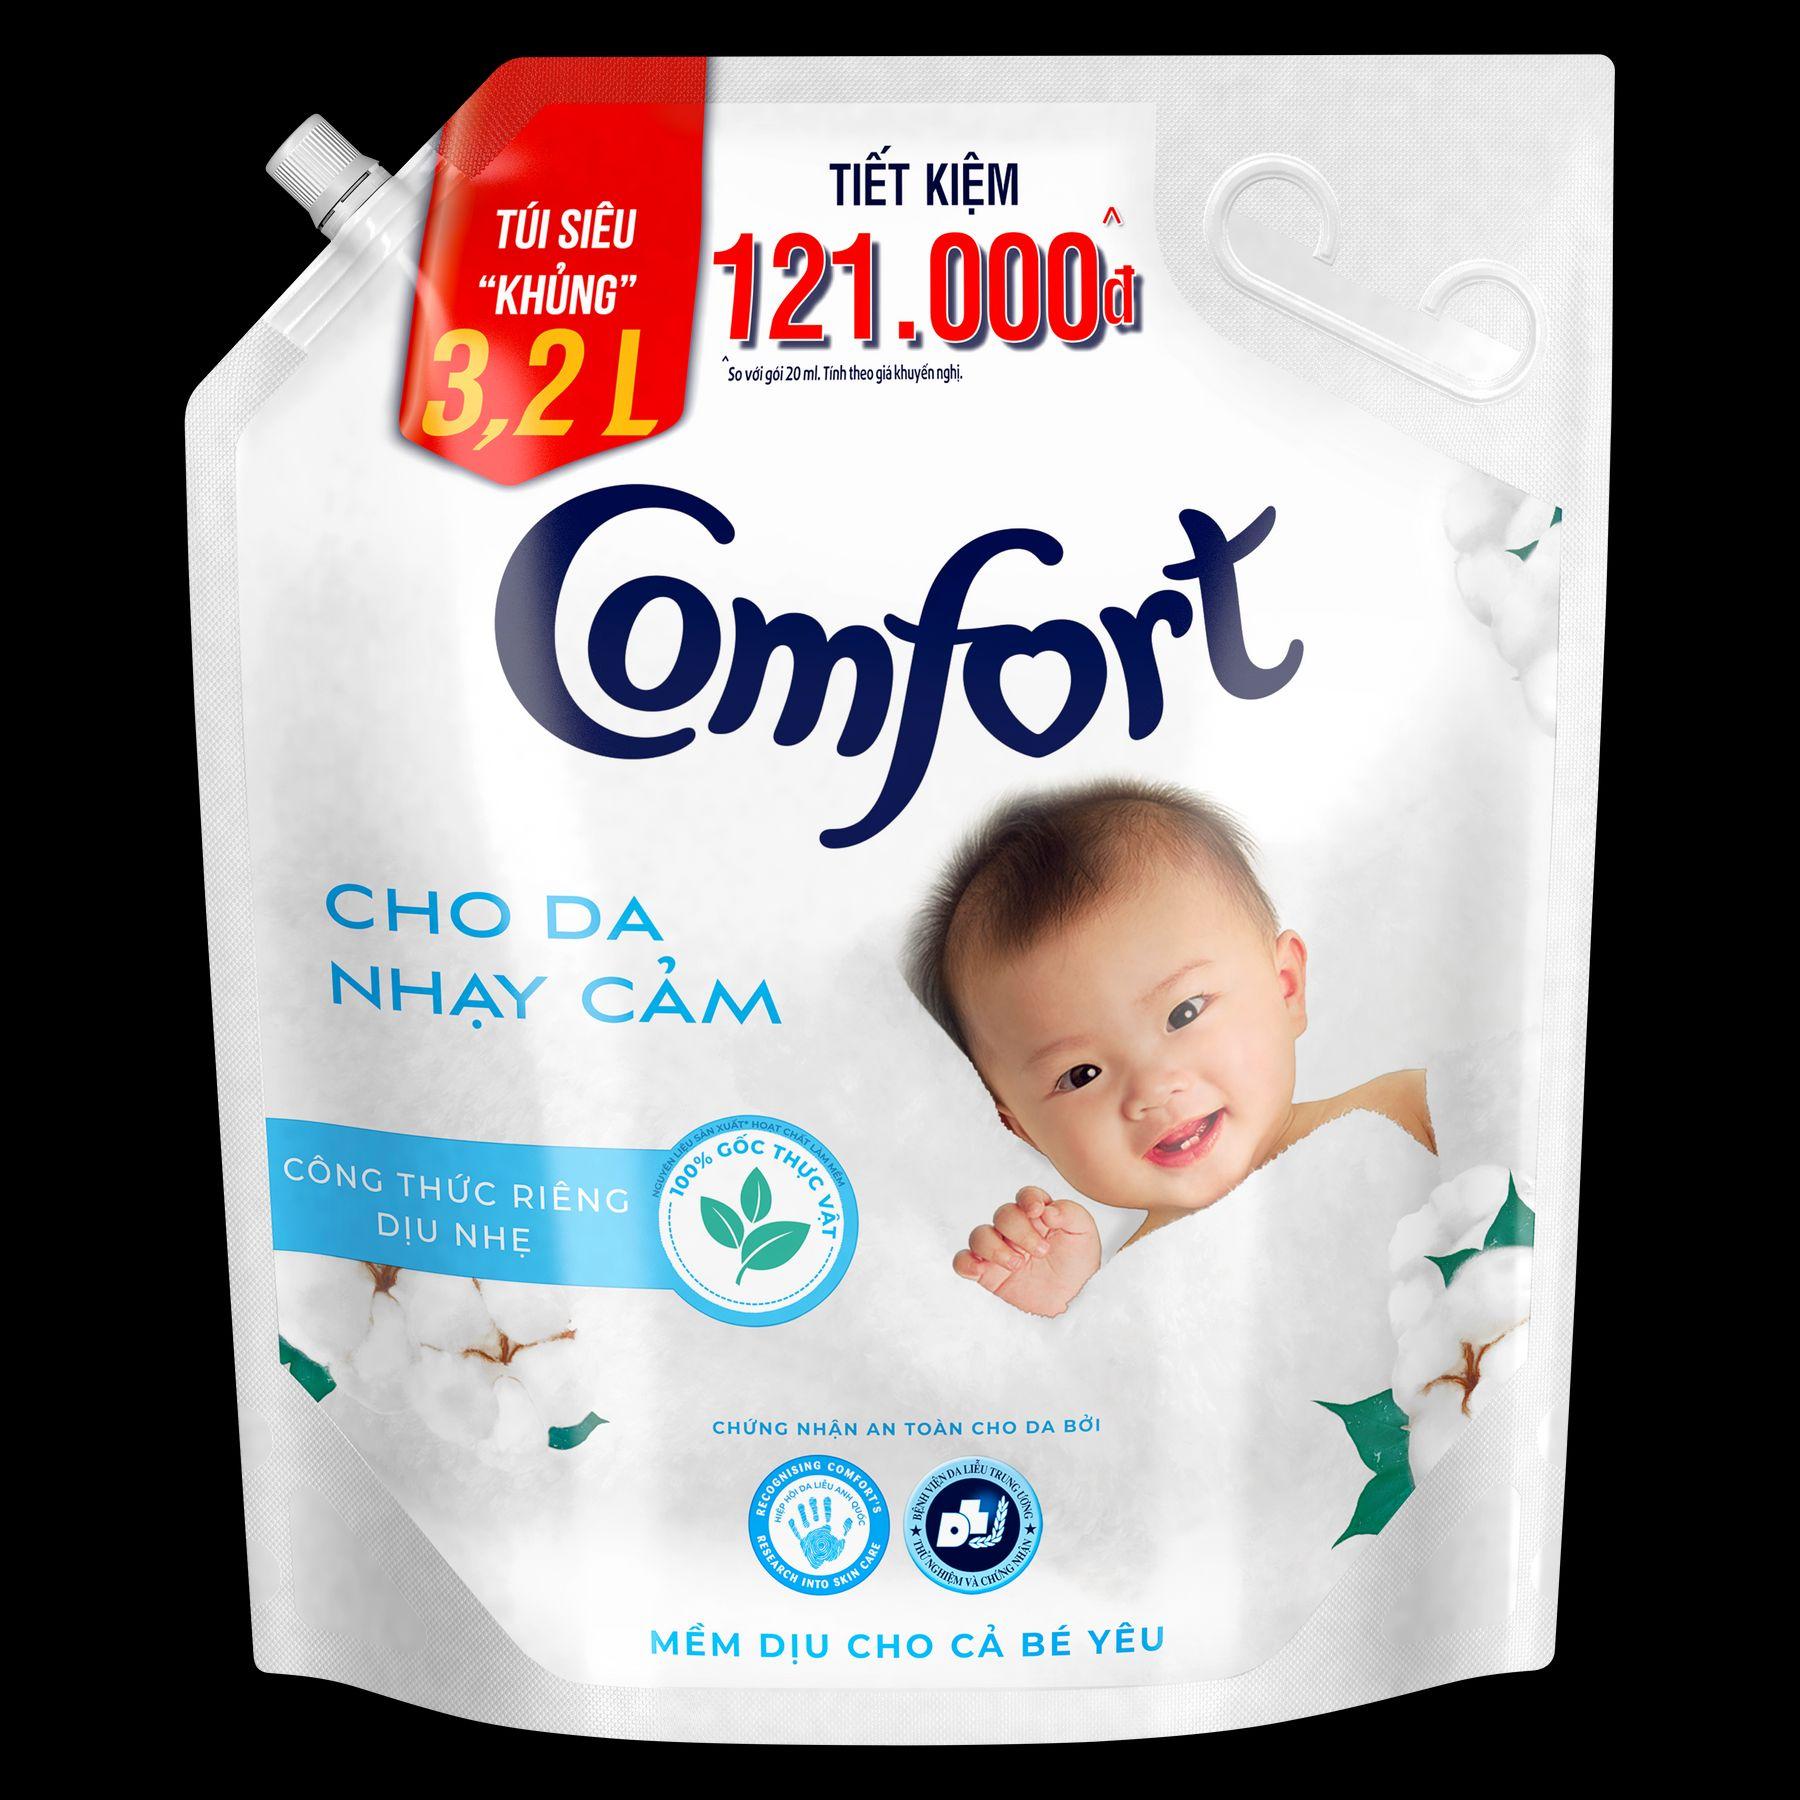 comfort cho da nhạy cảm